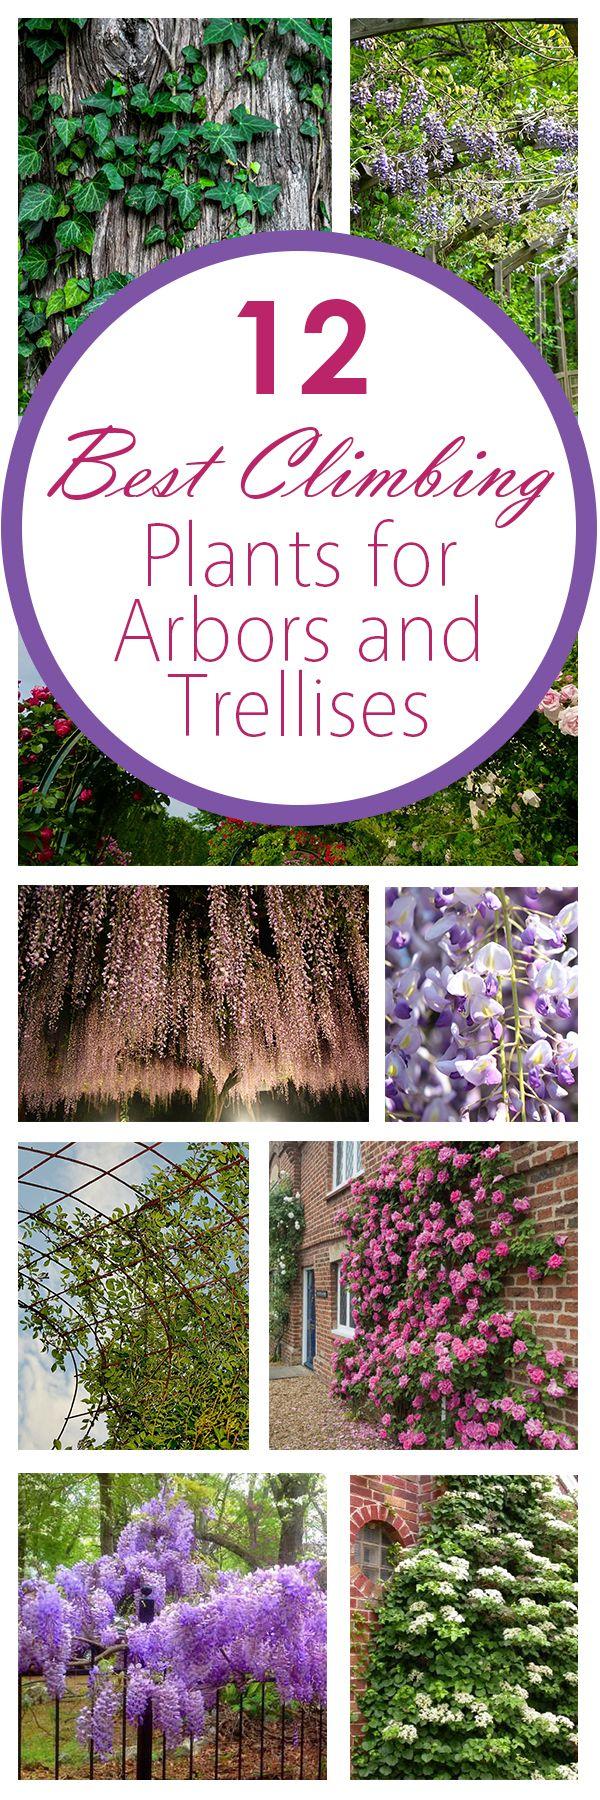 12 Best Climbing Plants for Arbors and Trellises Arbors Wedding